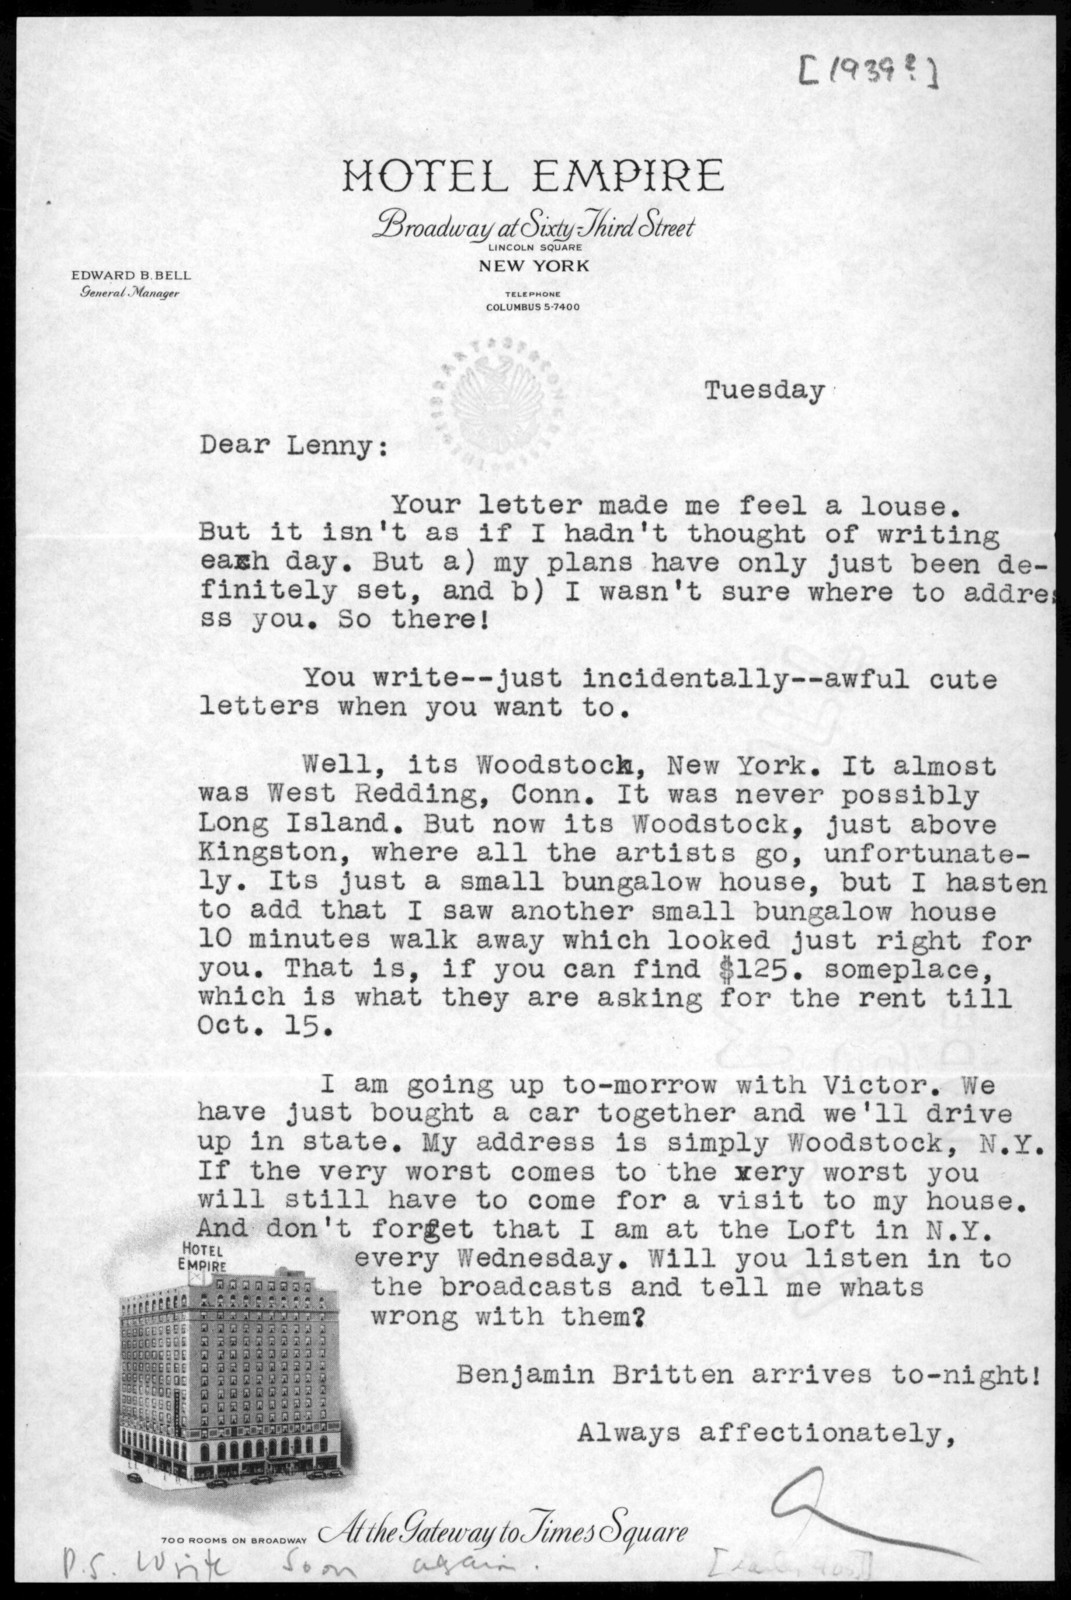 Letter from Aaron Copland to Leonard Bernstein, 1939